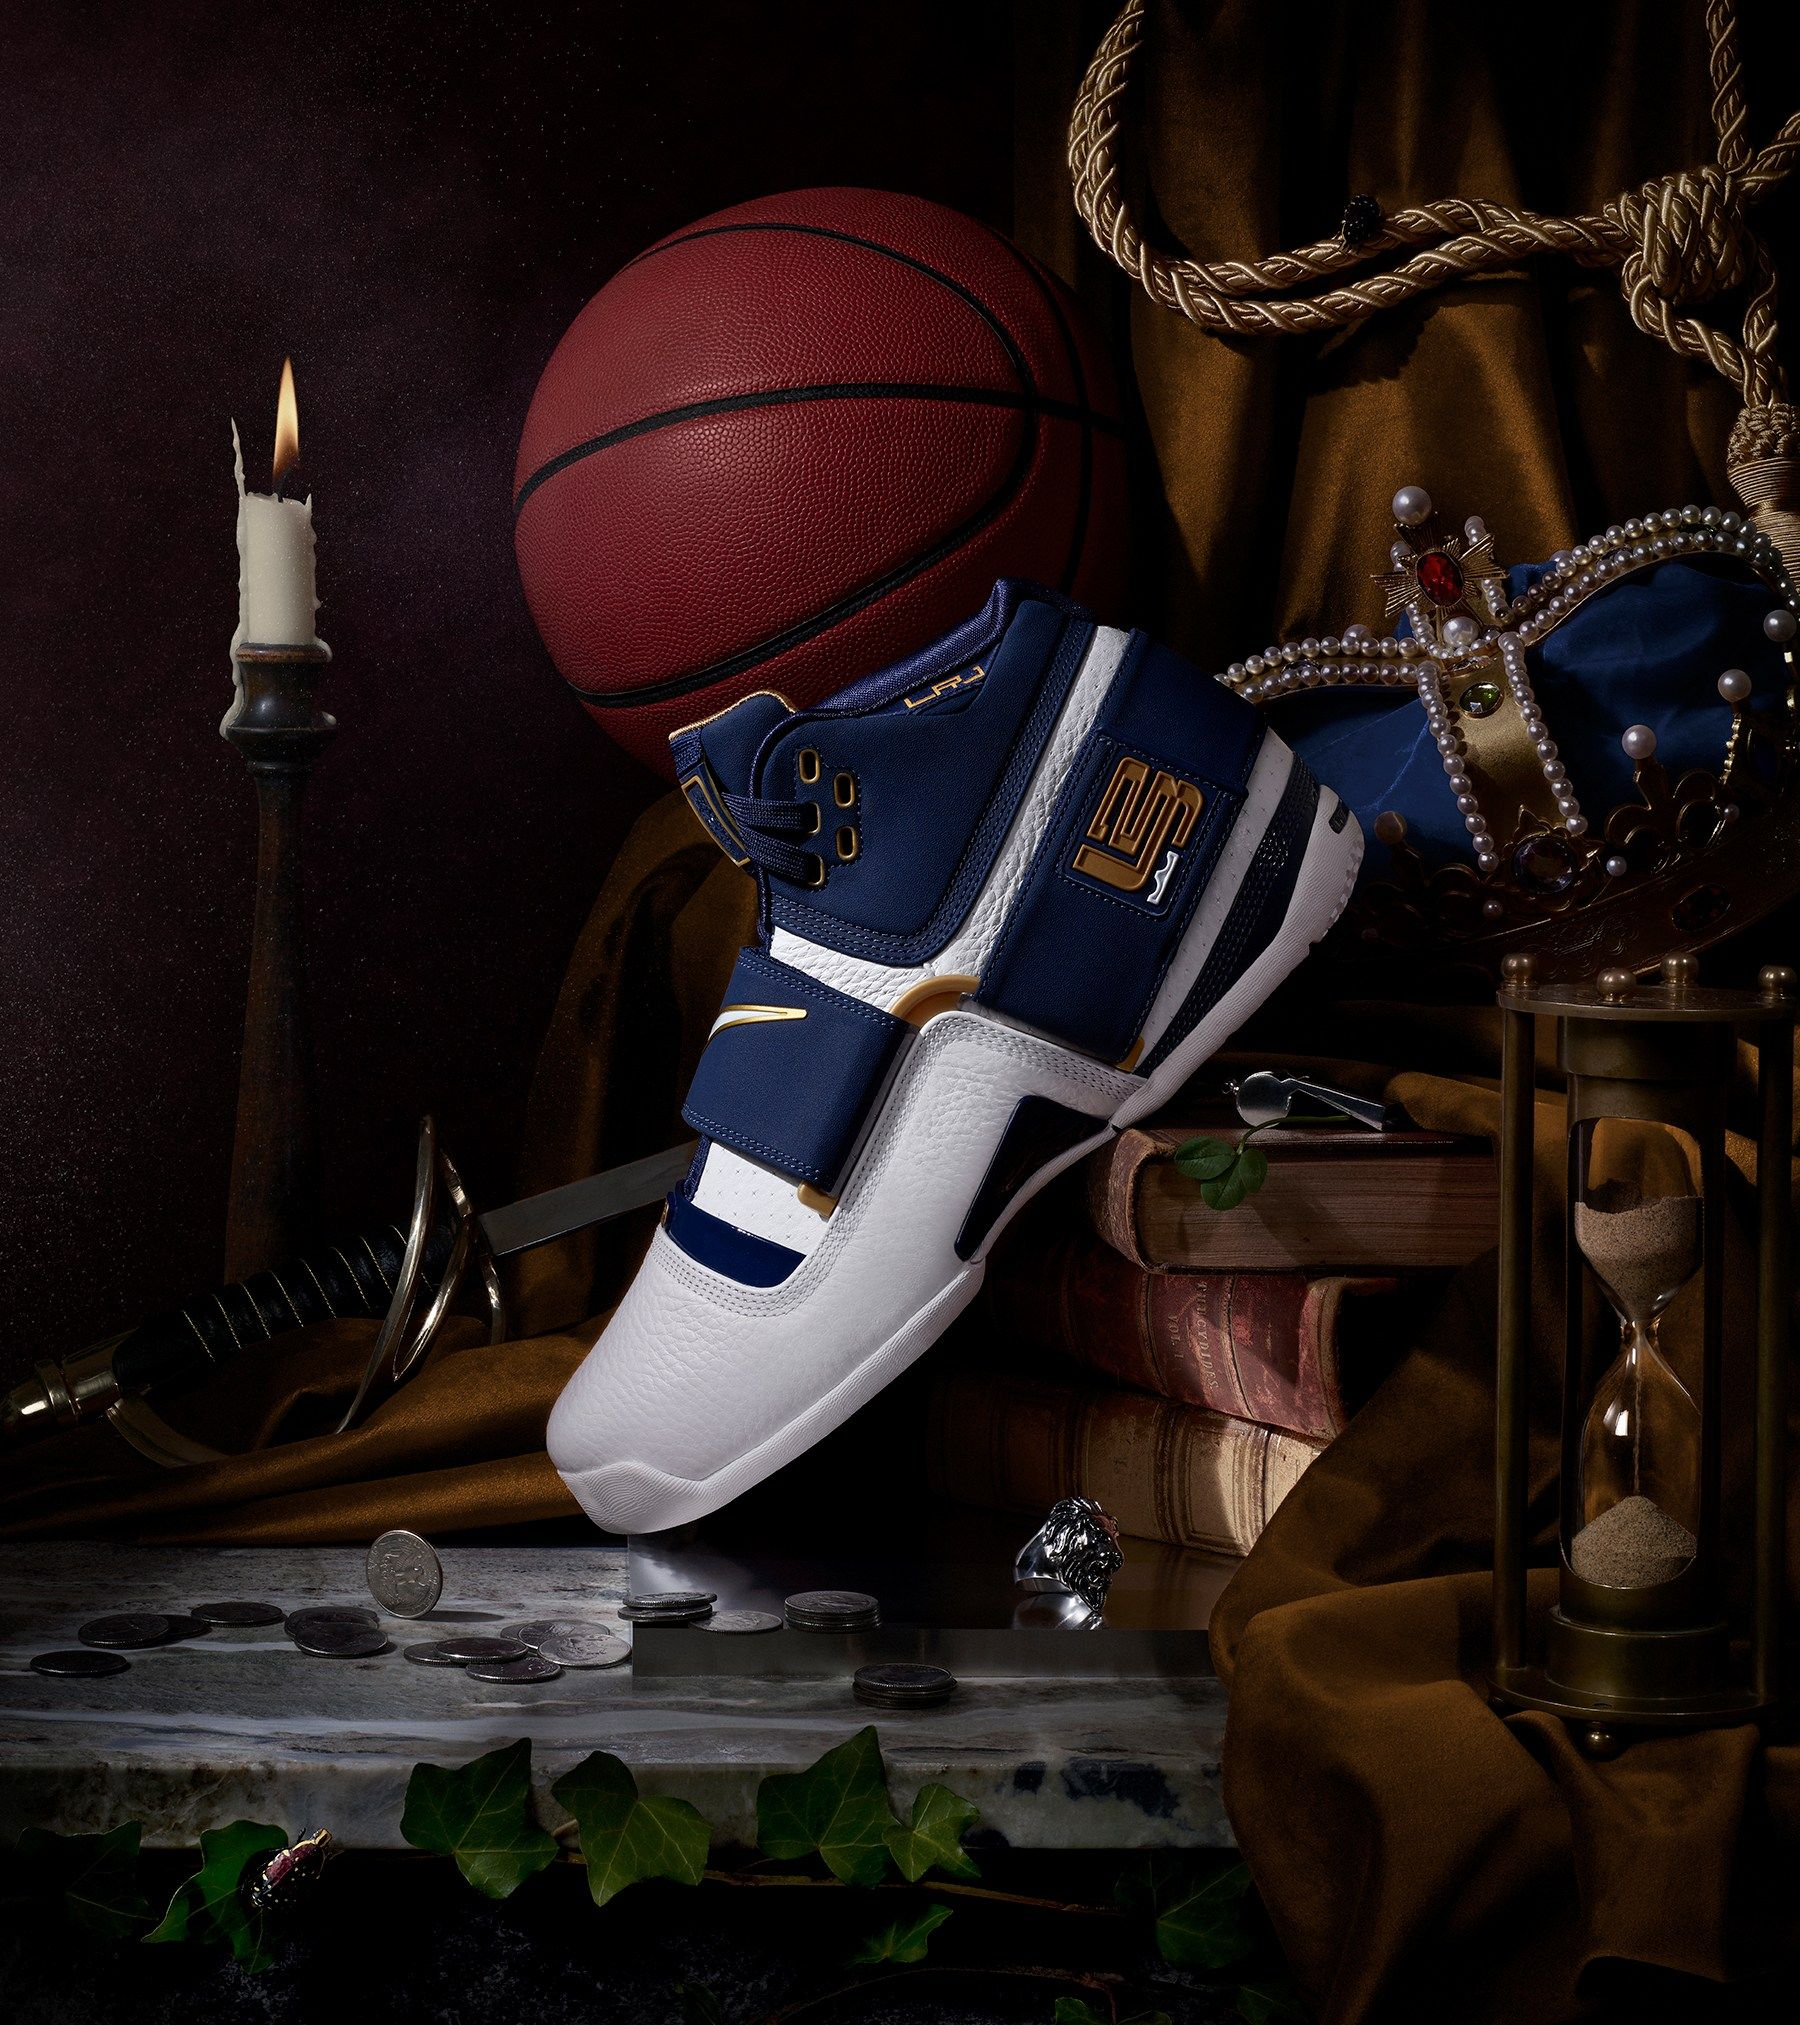 converse basket nba,converse basket nba solde